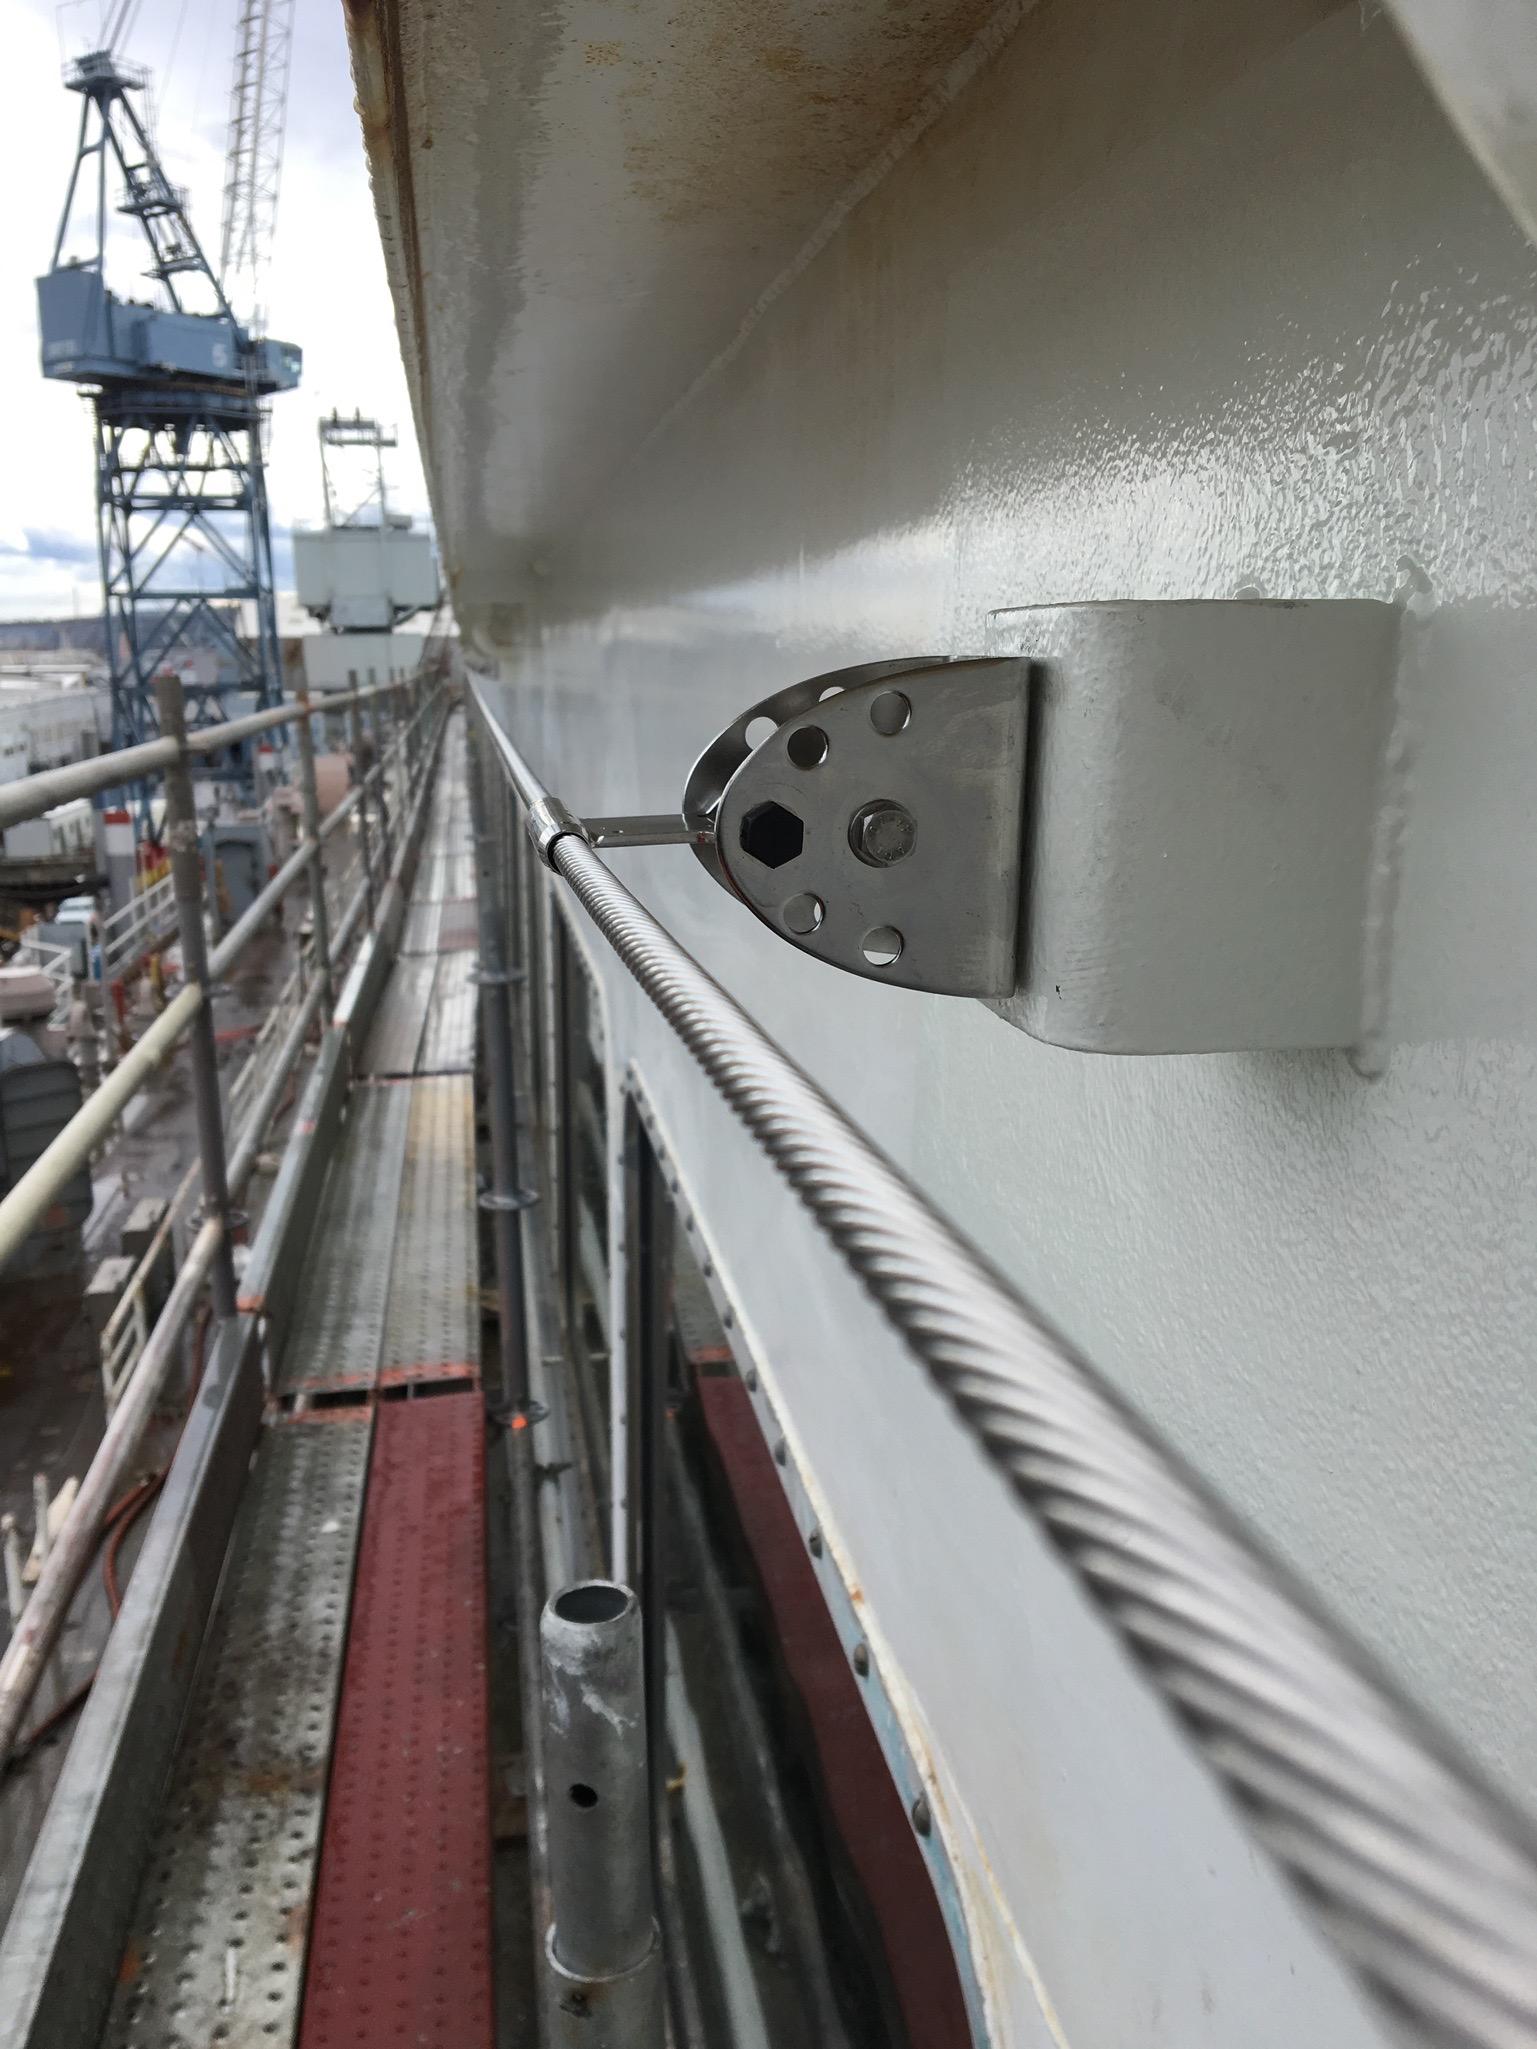 Horizontal lifeline on ferry boat for window washers